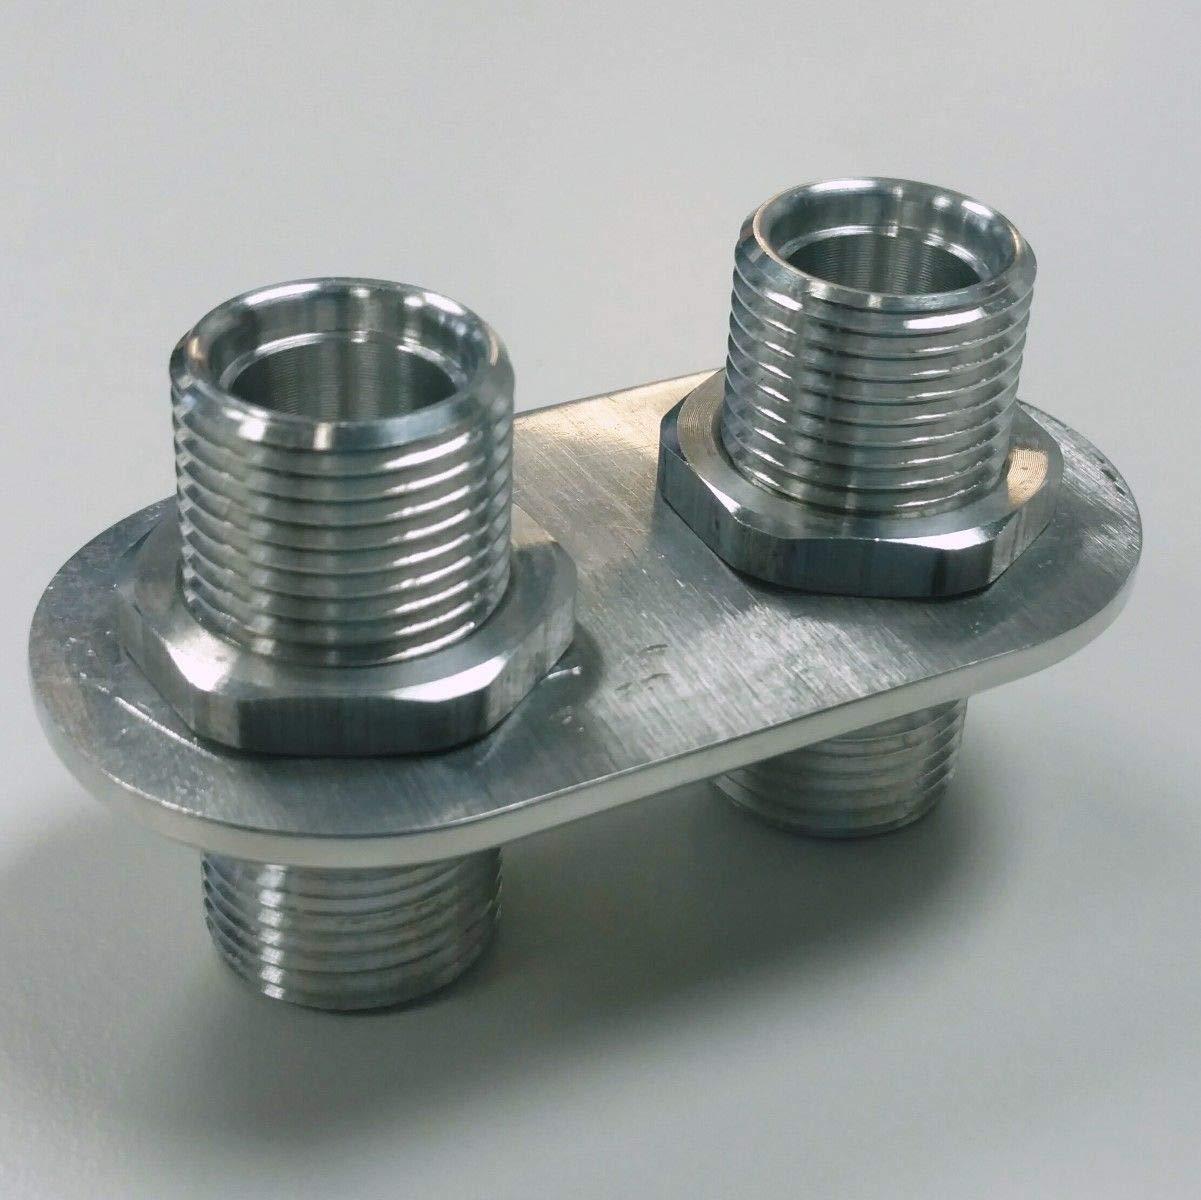 Anodized Aluminum 2 Port Ac Air Conditioning Heater Hose Firewall Bulkhead 1-L 1-L